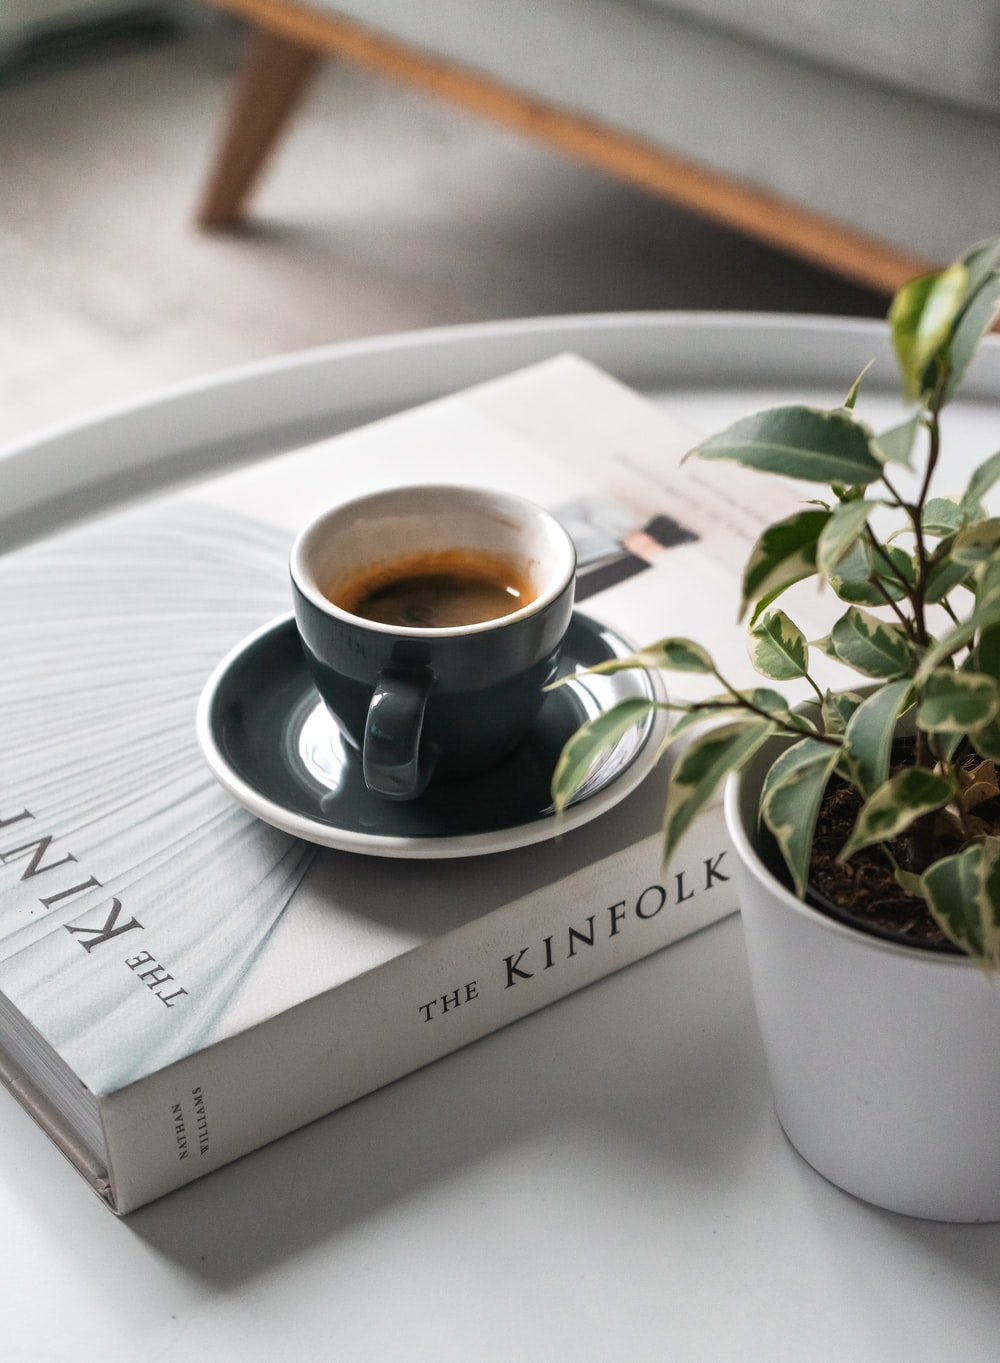 shallow focus photo of black ceramic mug and saucer on white book